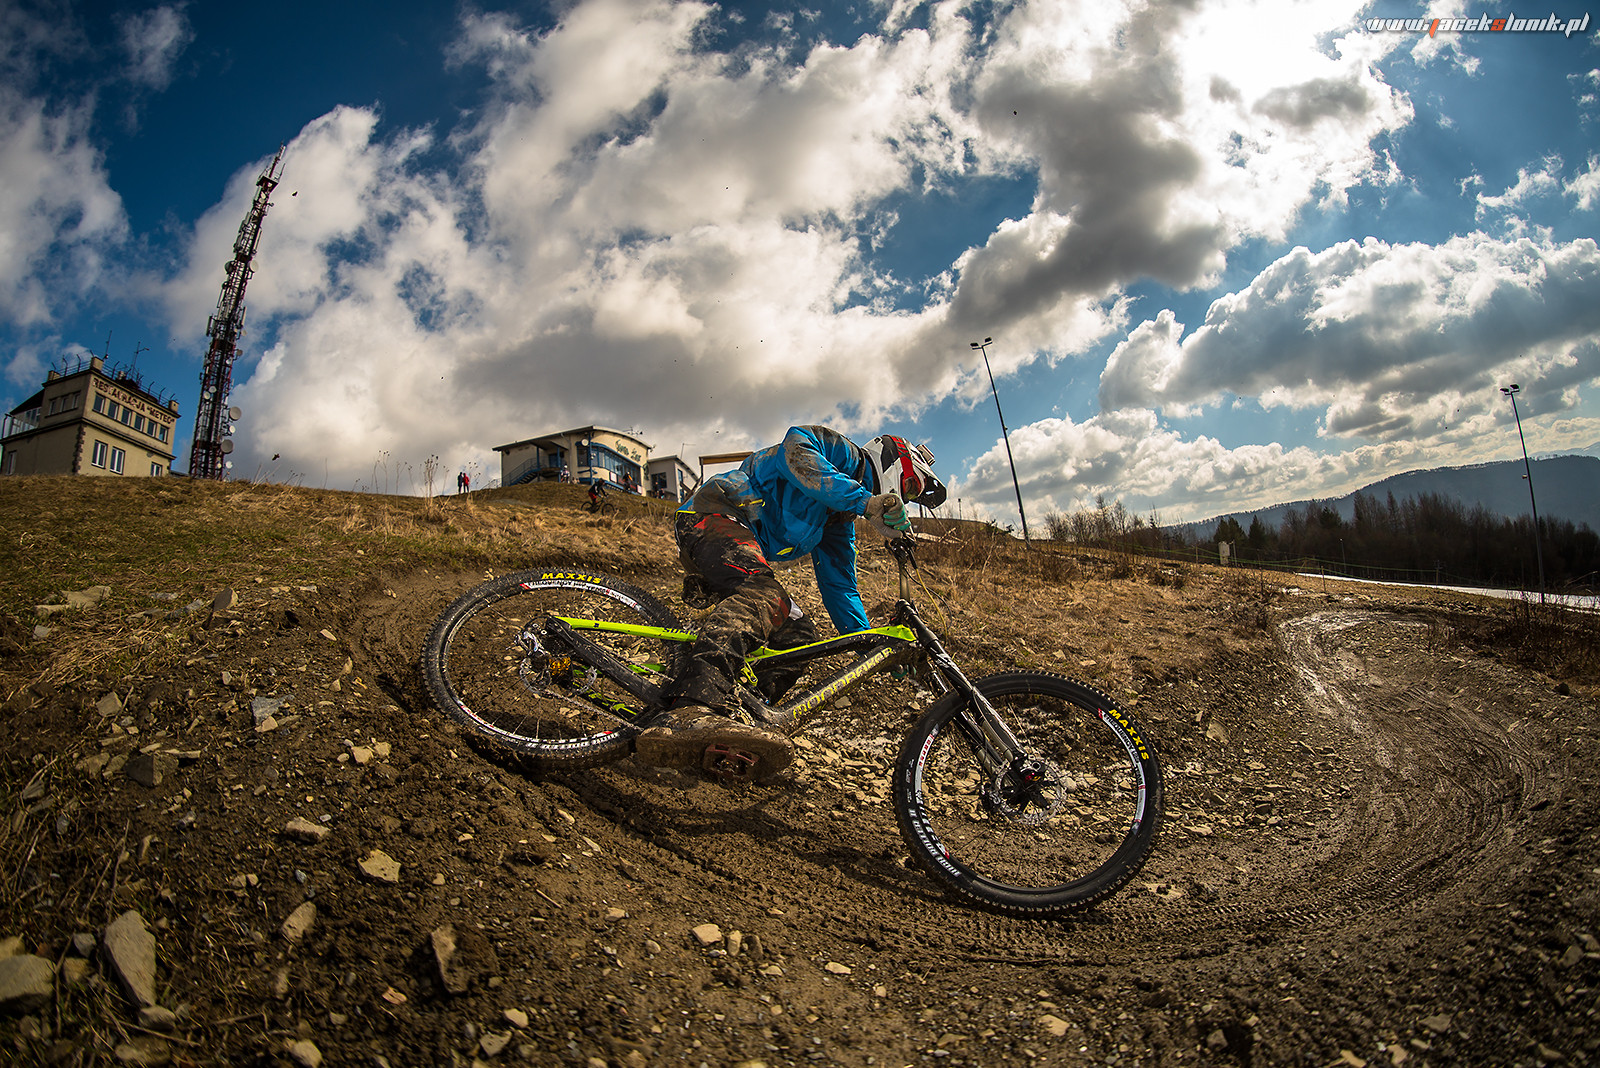 Berm! - JacekSlonik - Mountain Biking Pictures - Vital MTB